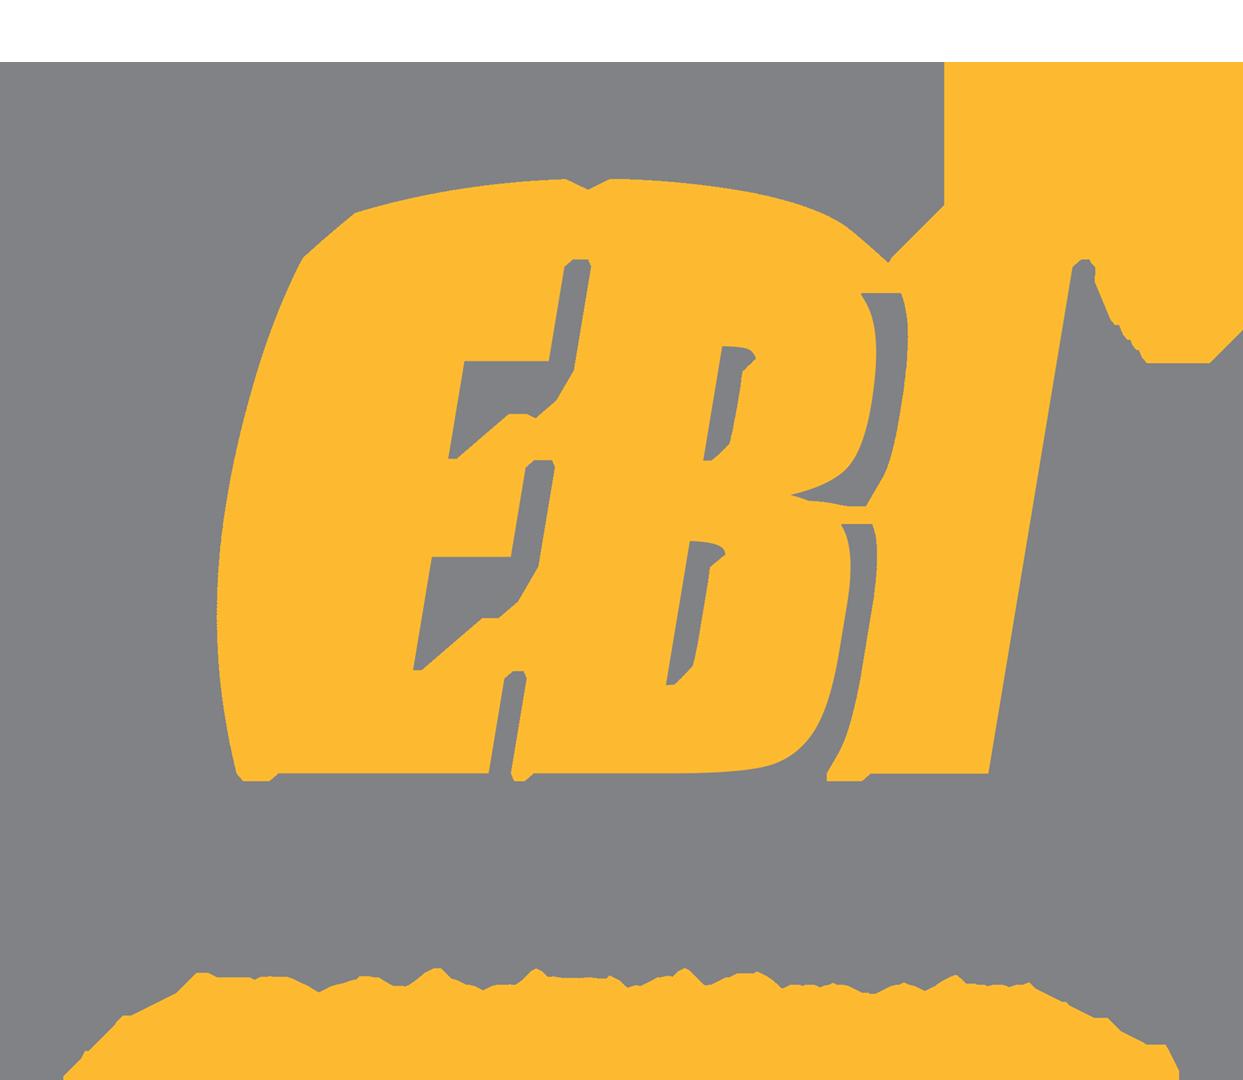 Electrical Builders Inc. (EBI)